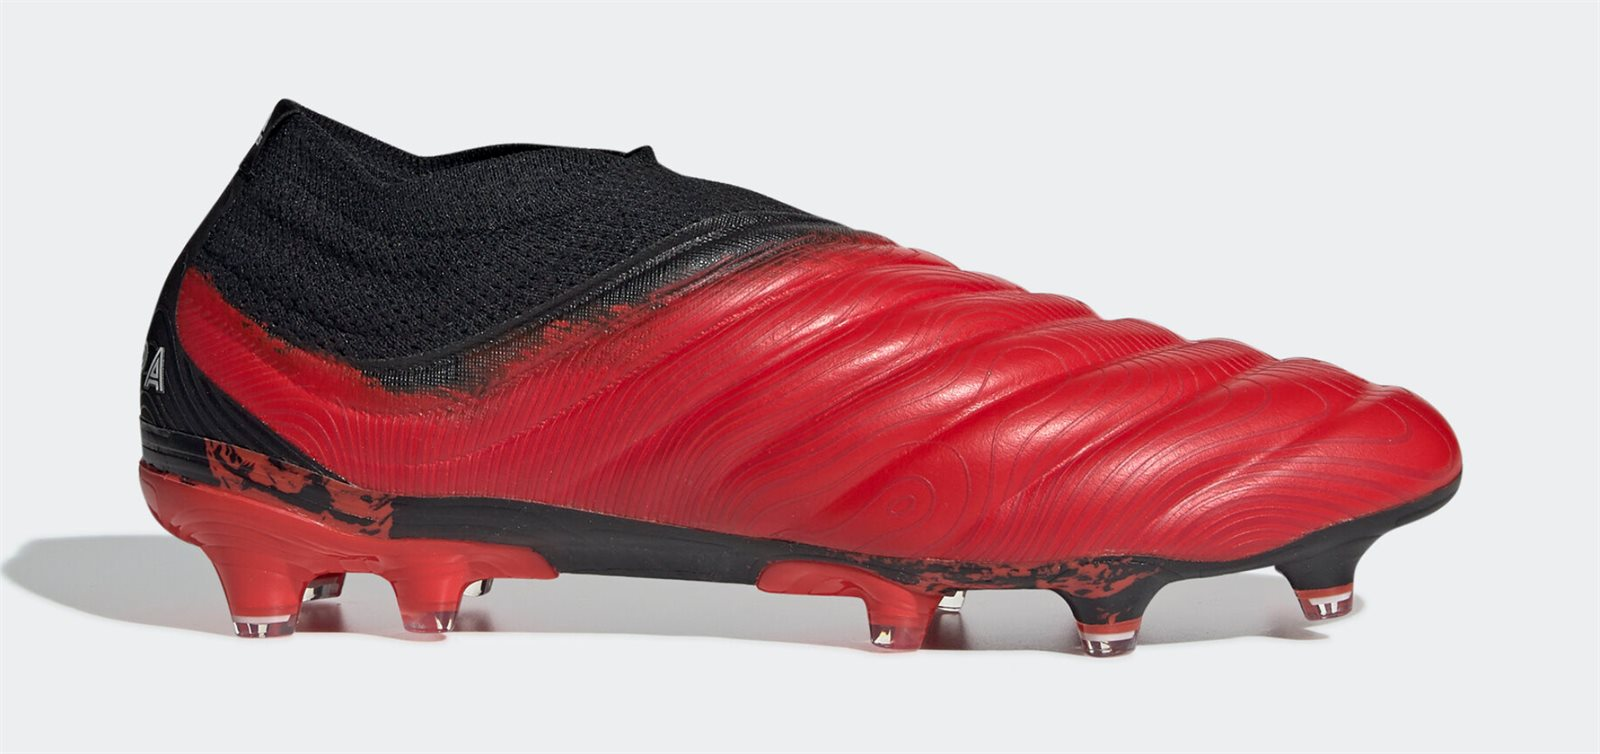 scarpe adidas dybala 65% di sconto sglabs.it